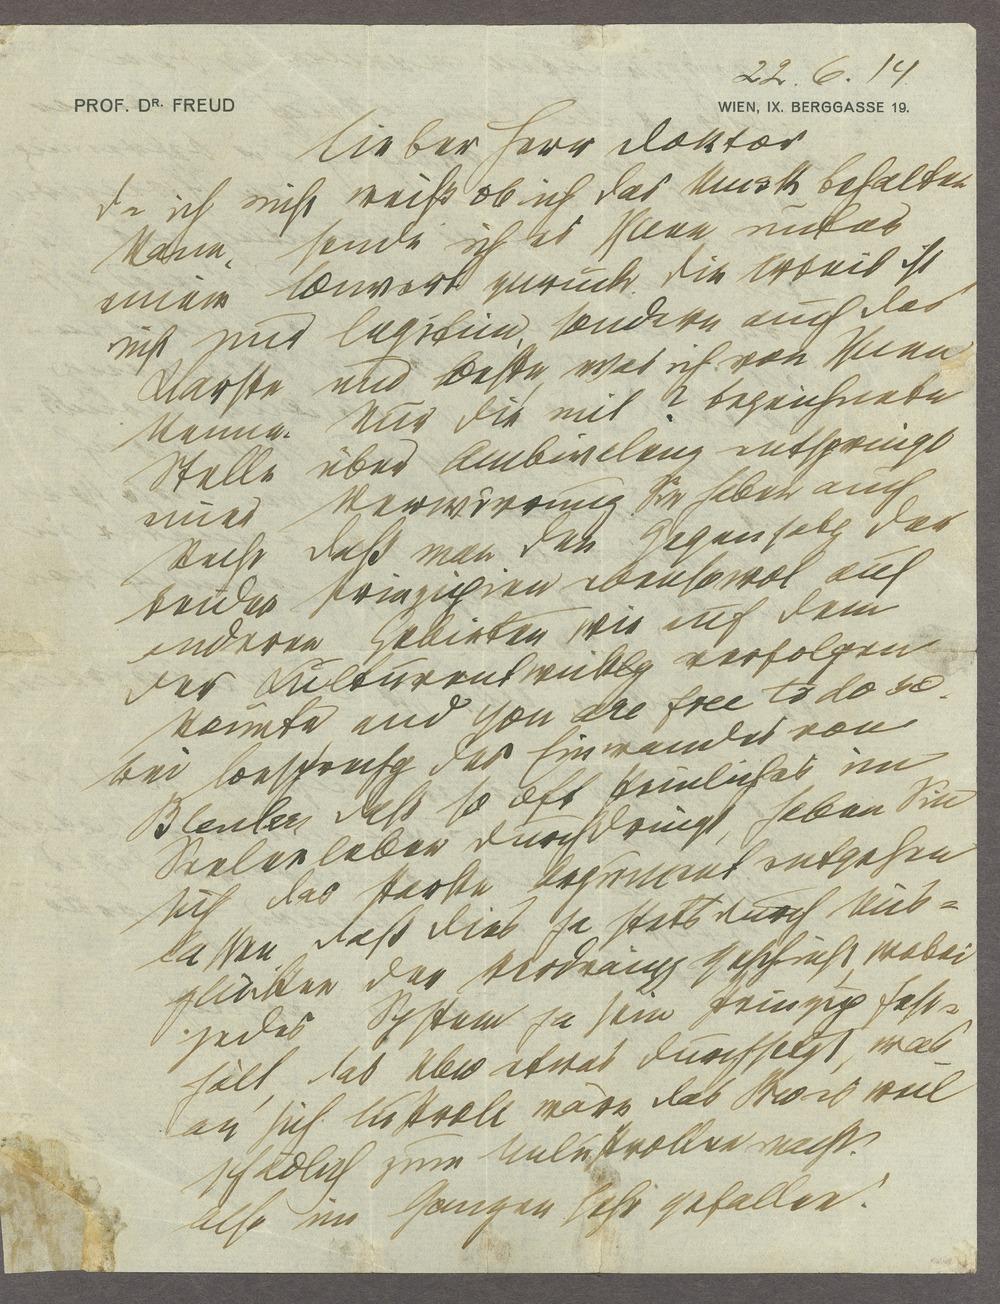 Sigmund Freud correspondence - 1 [Box 1, Folder 5]